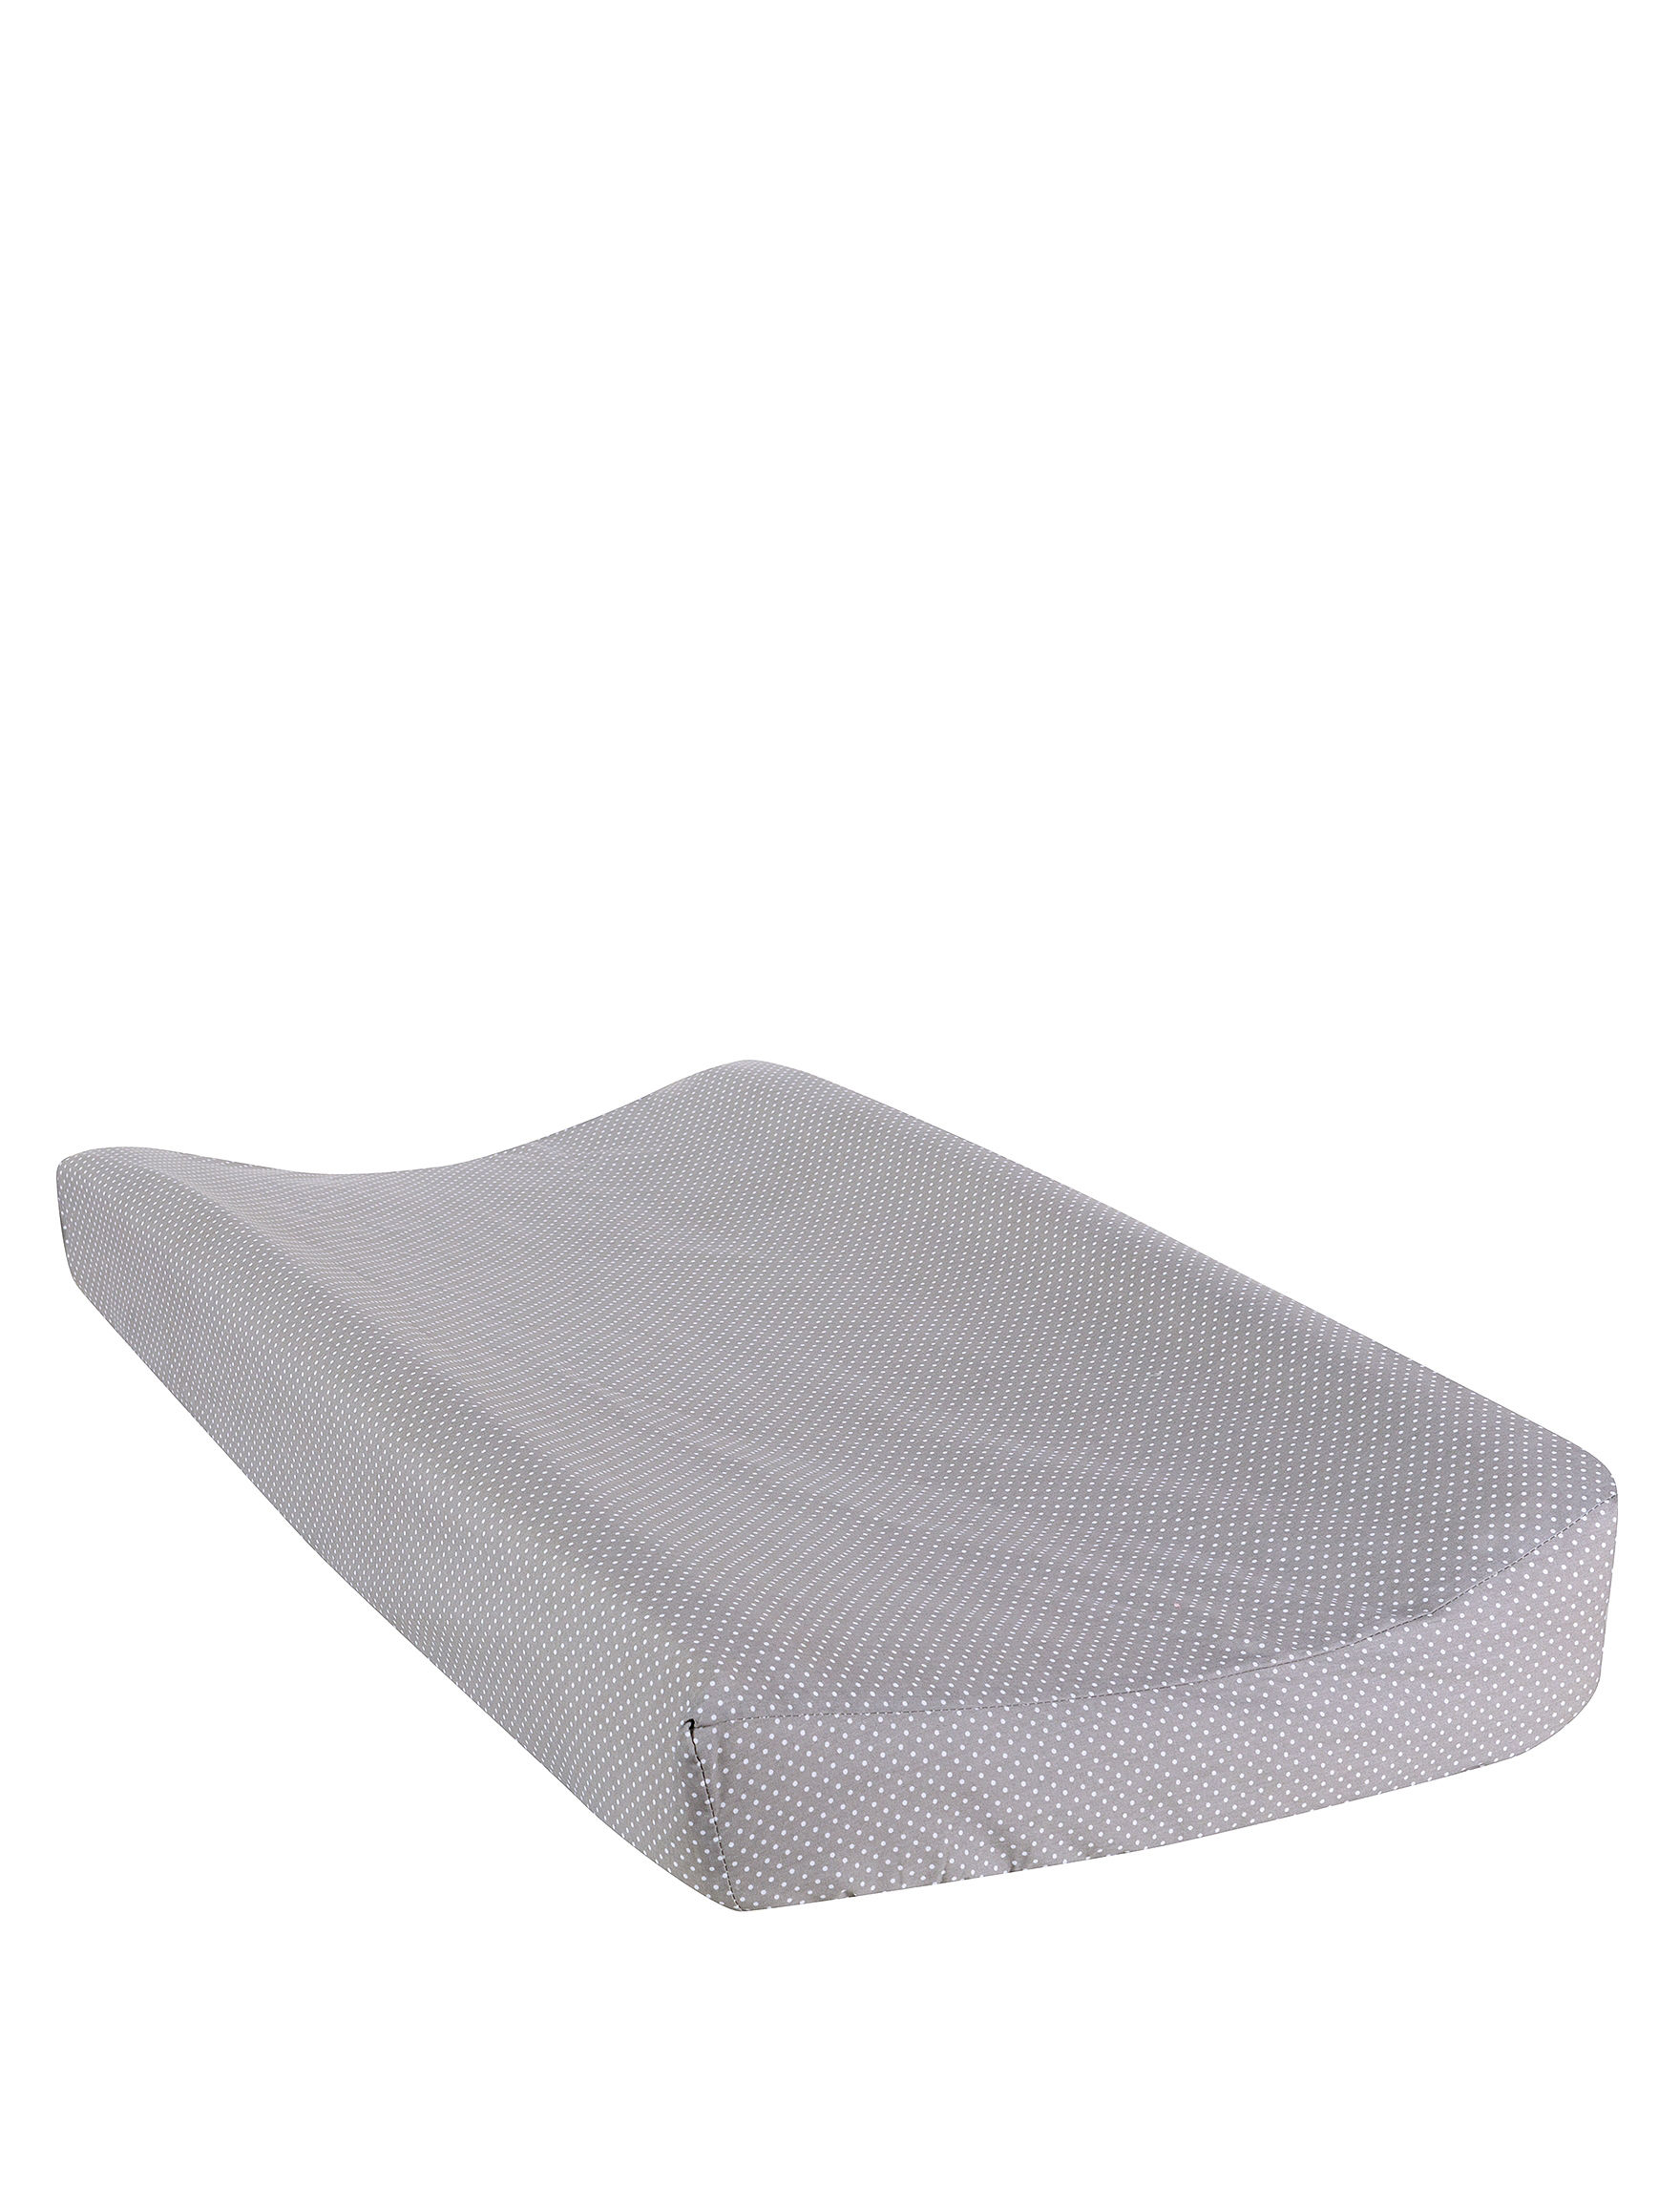 Trend Lab Grey / White